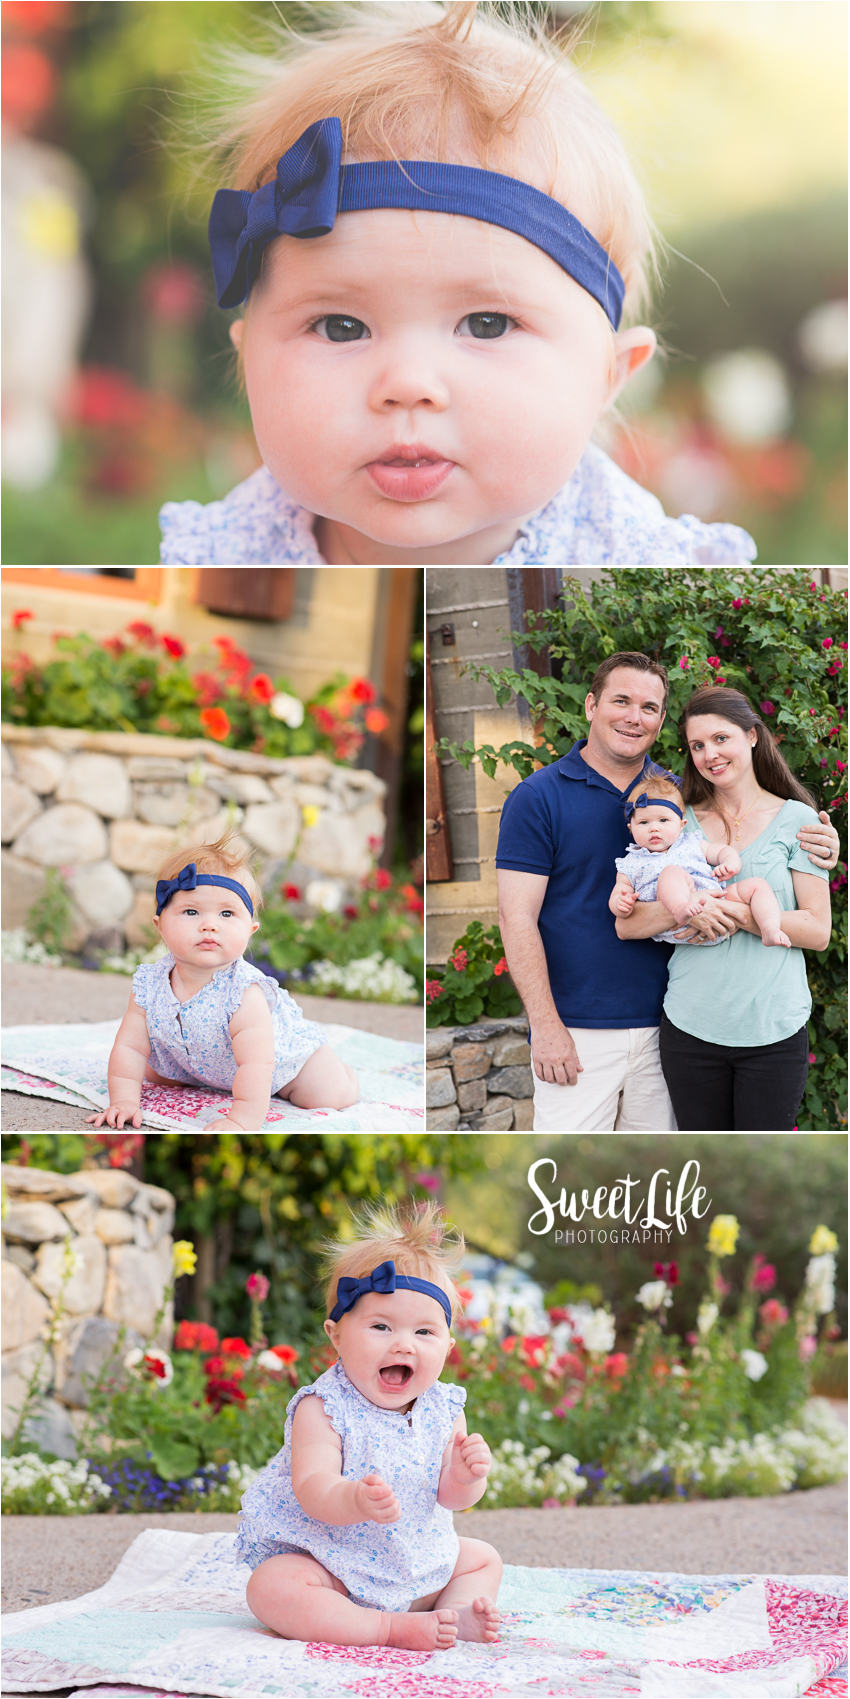 Scottsdale Baby Photographer : SweetLife Photography